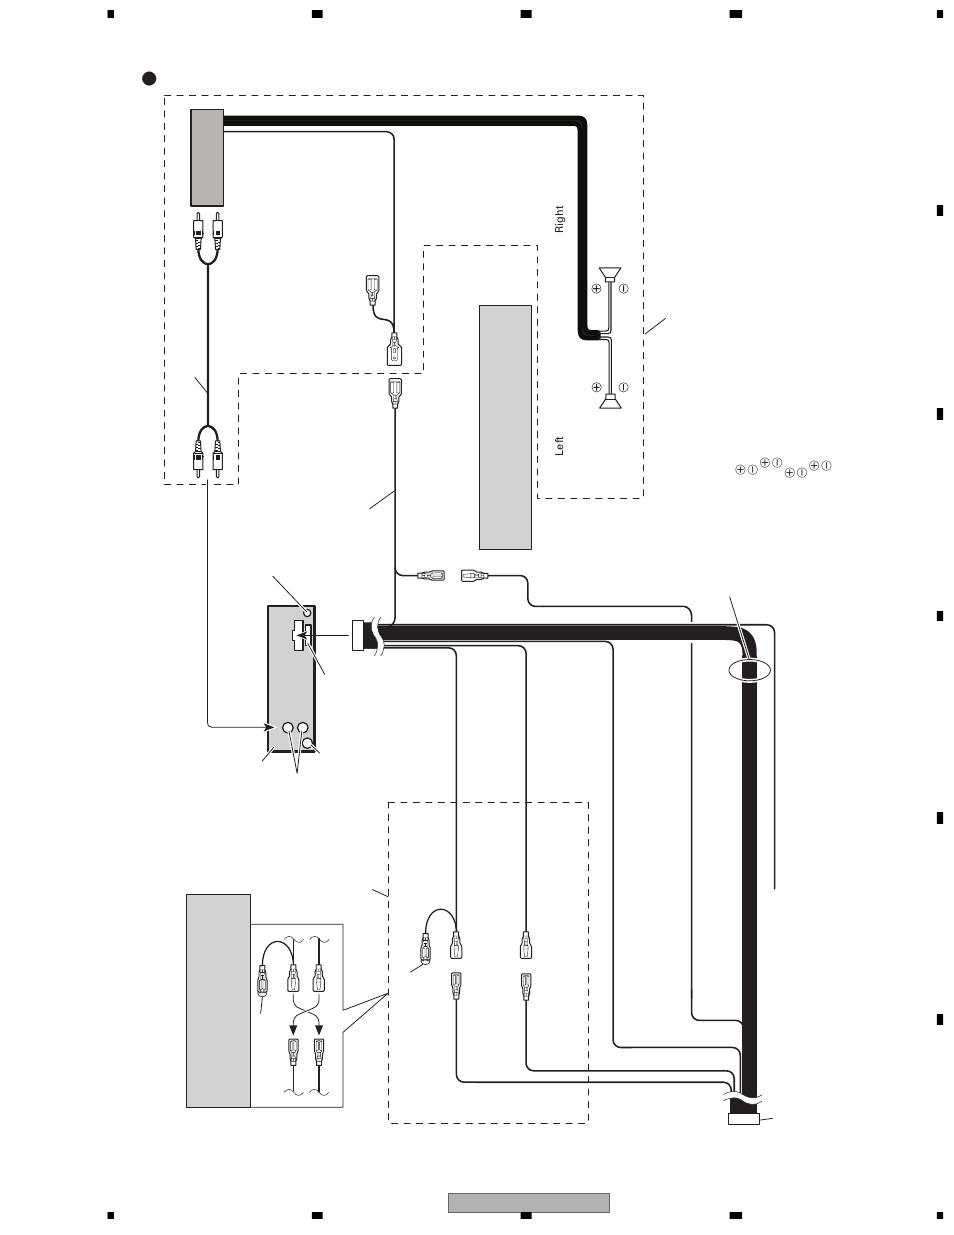 Deh Wiring Diagram Further Pioneer Deh Wiring Diagram Also Pioneer Deh